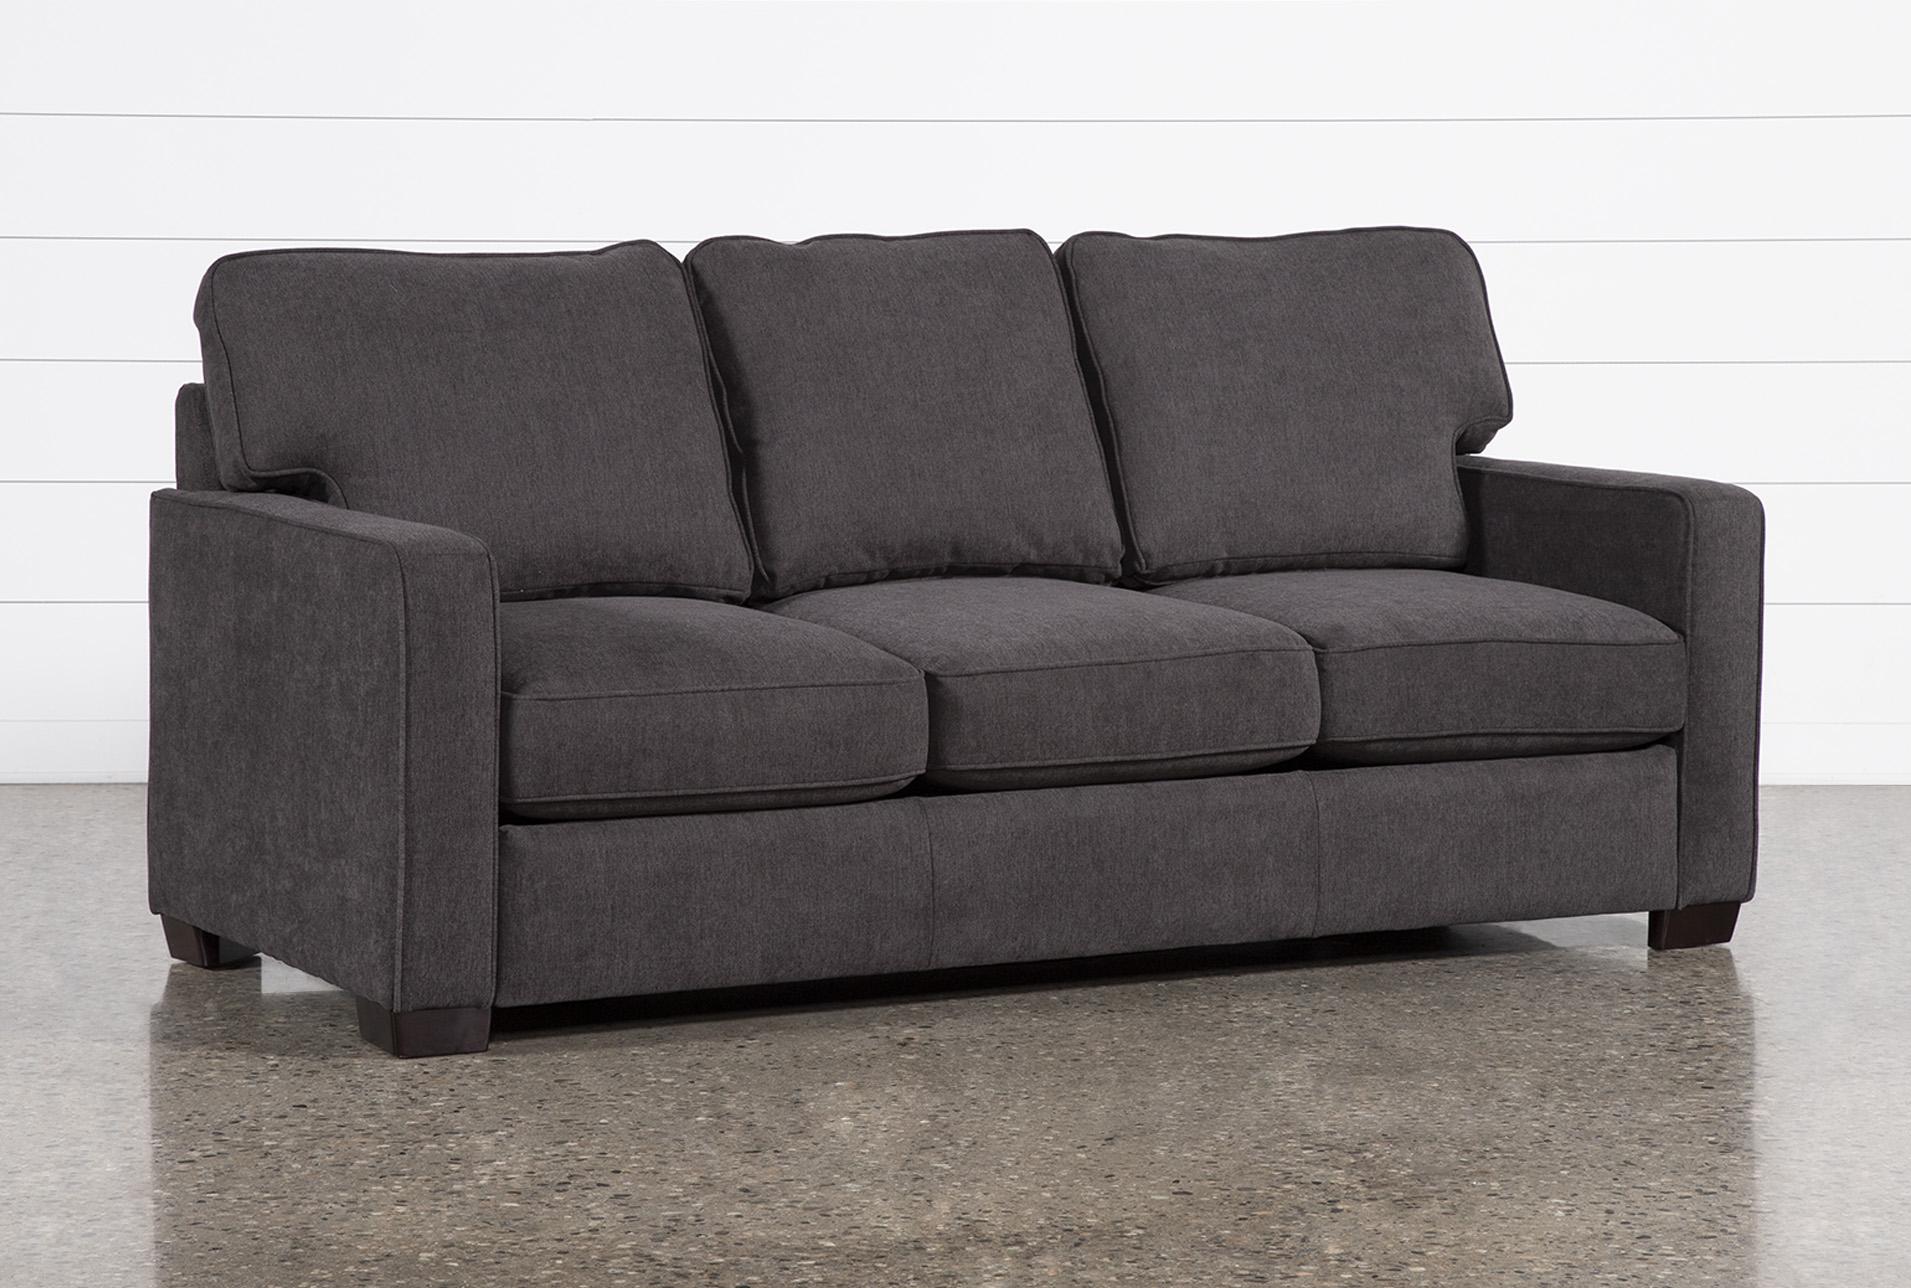 - Morris Charcoal Full Sleeper Sofa With Memory Foam Mattress